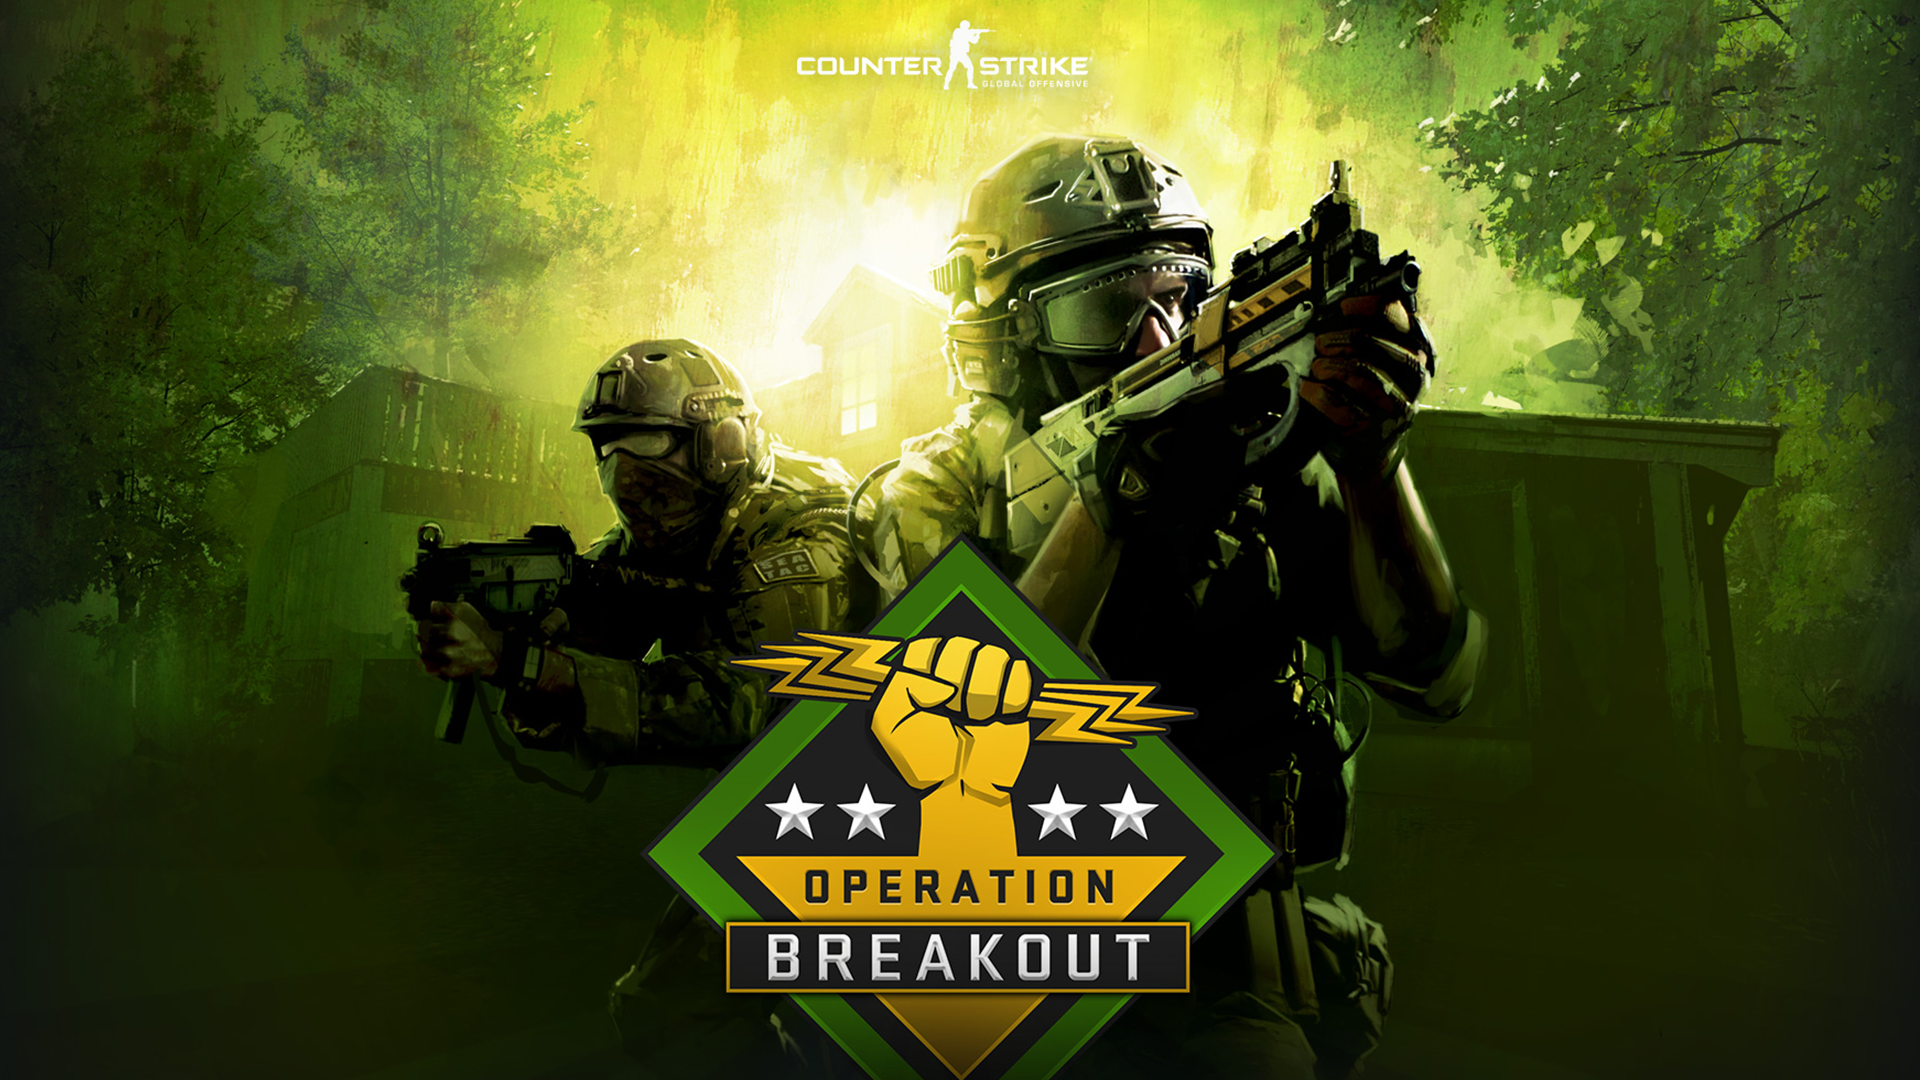 Counter strike : global operation cs go no steam черный экран